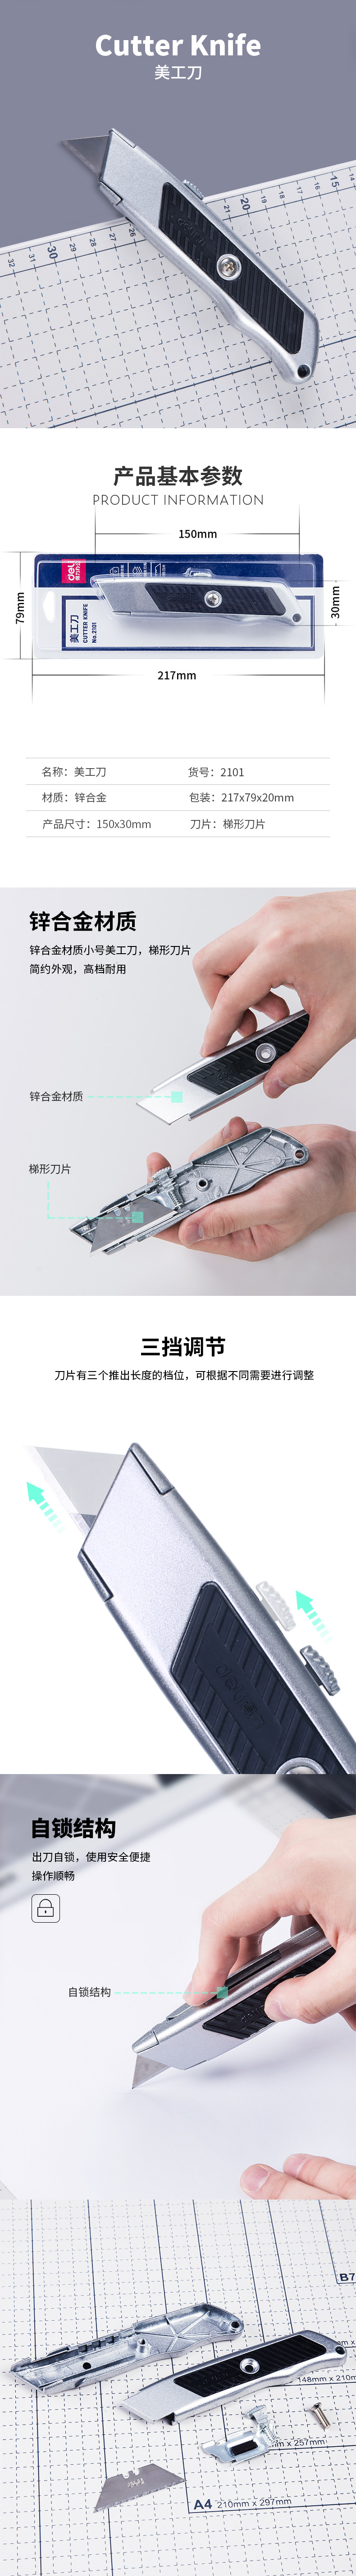 de zinco multi-funcional manual faca trapezoide metal